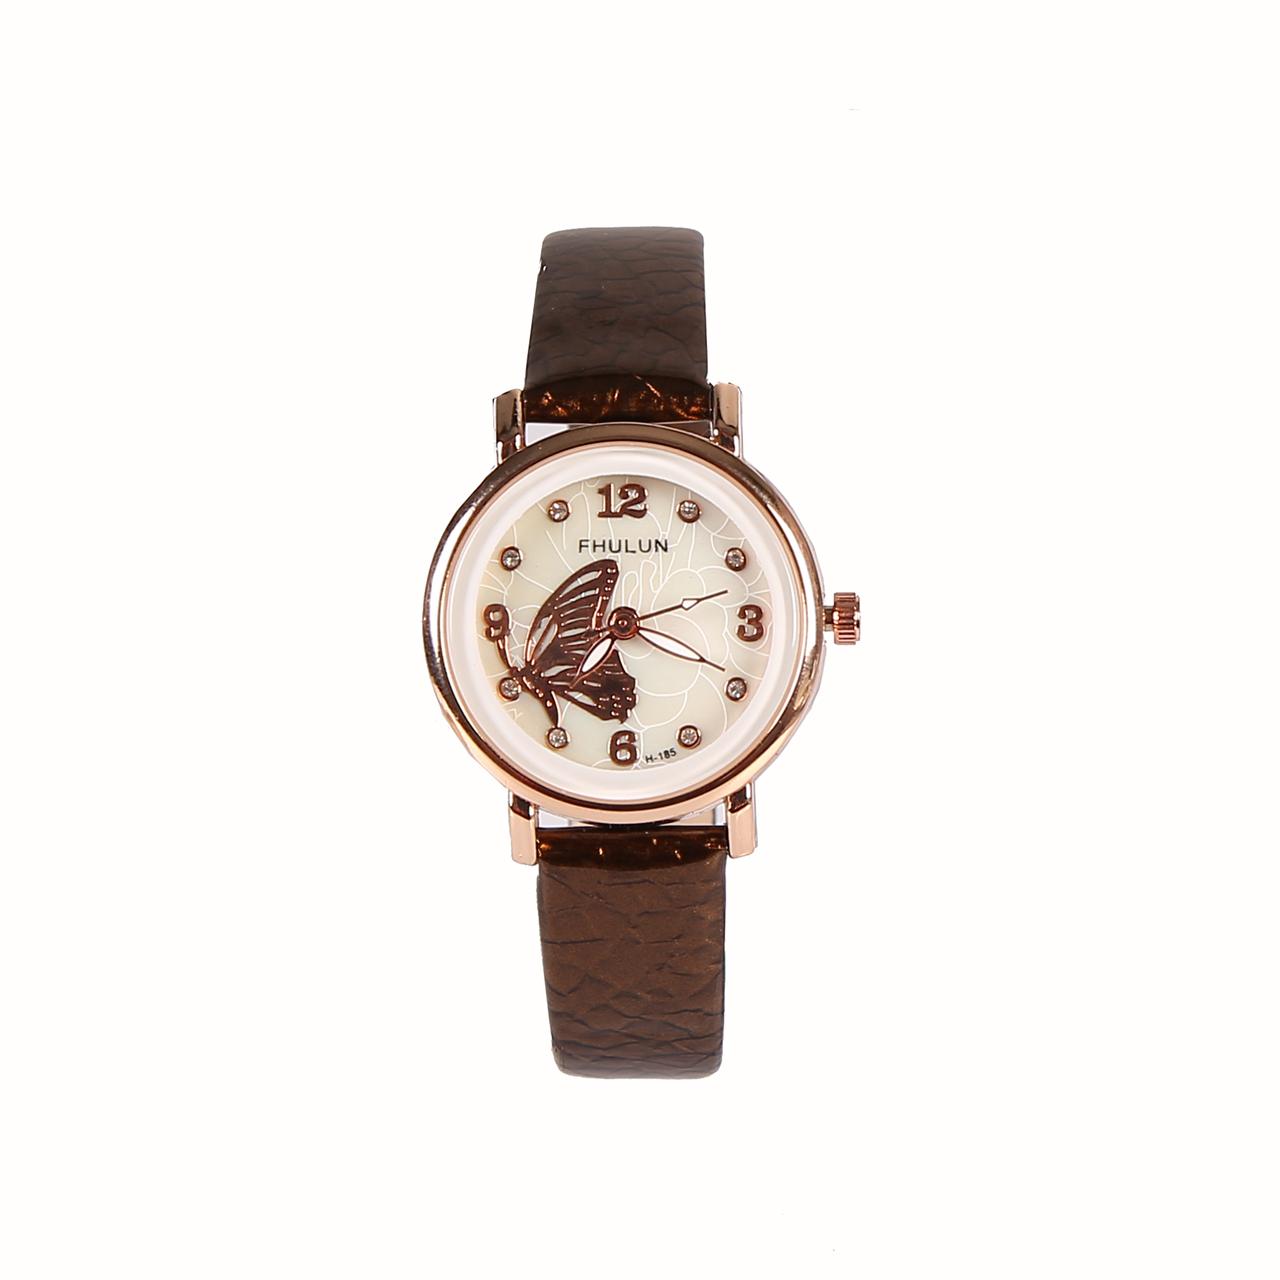 ساعت مچی عقربه ای زنانه فولون مدل پروانه ای کد 01